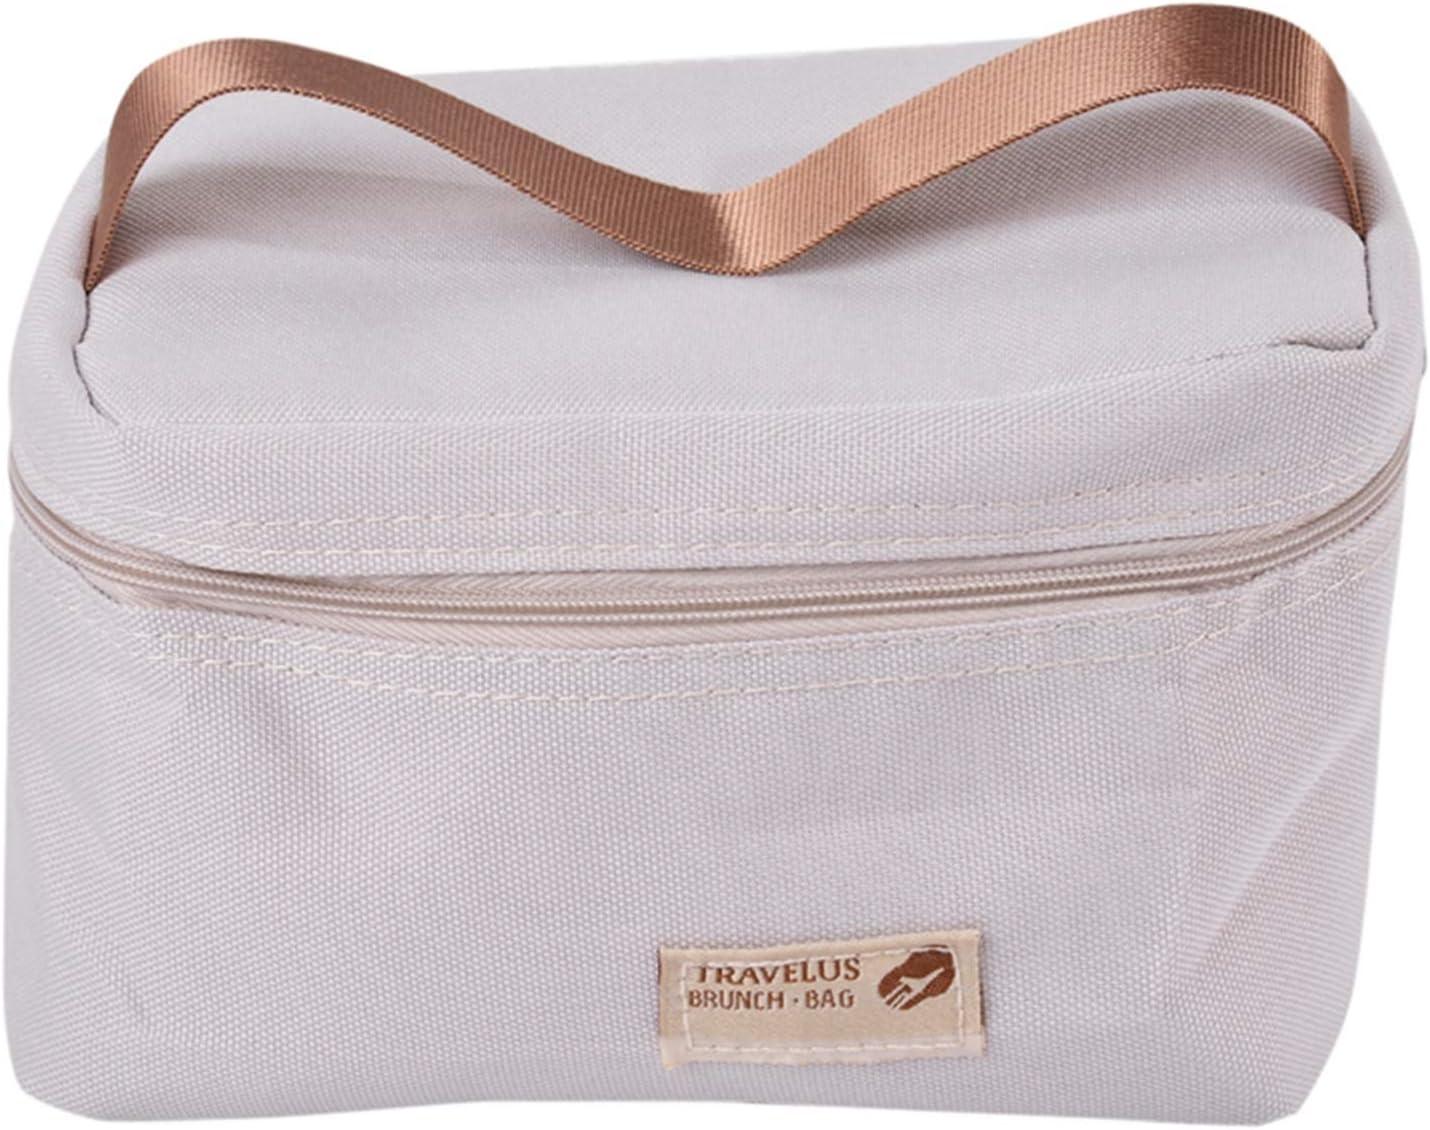 HEHXKJ Picnic Bag Picnin Portable Food Las Vegas Mall Thermal Pic Insulated New arrival